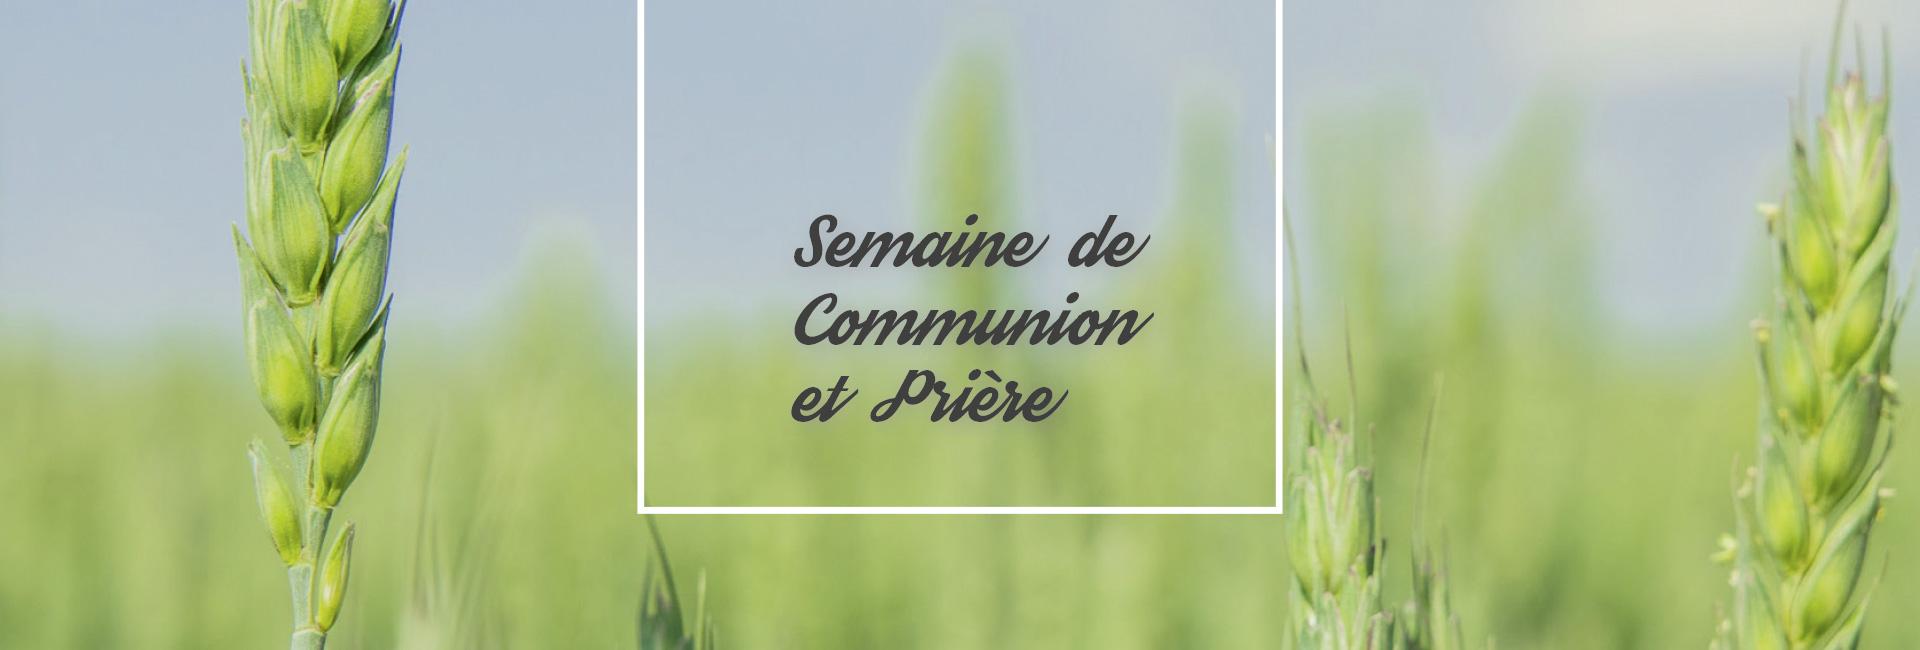 slider sfh communion et priere